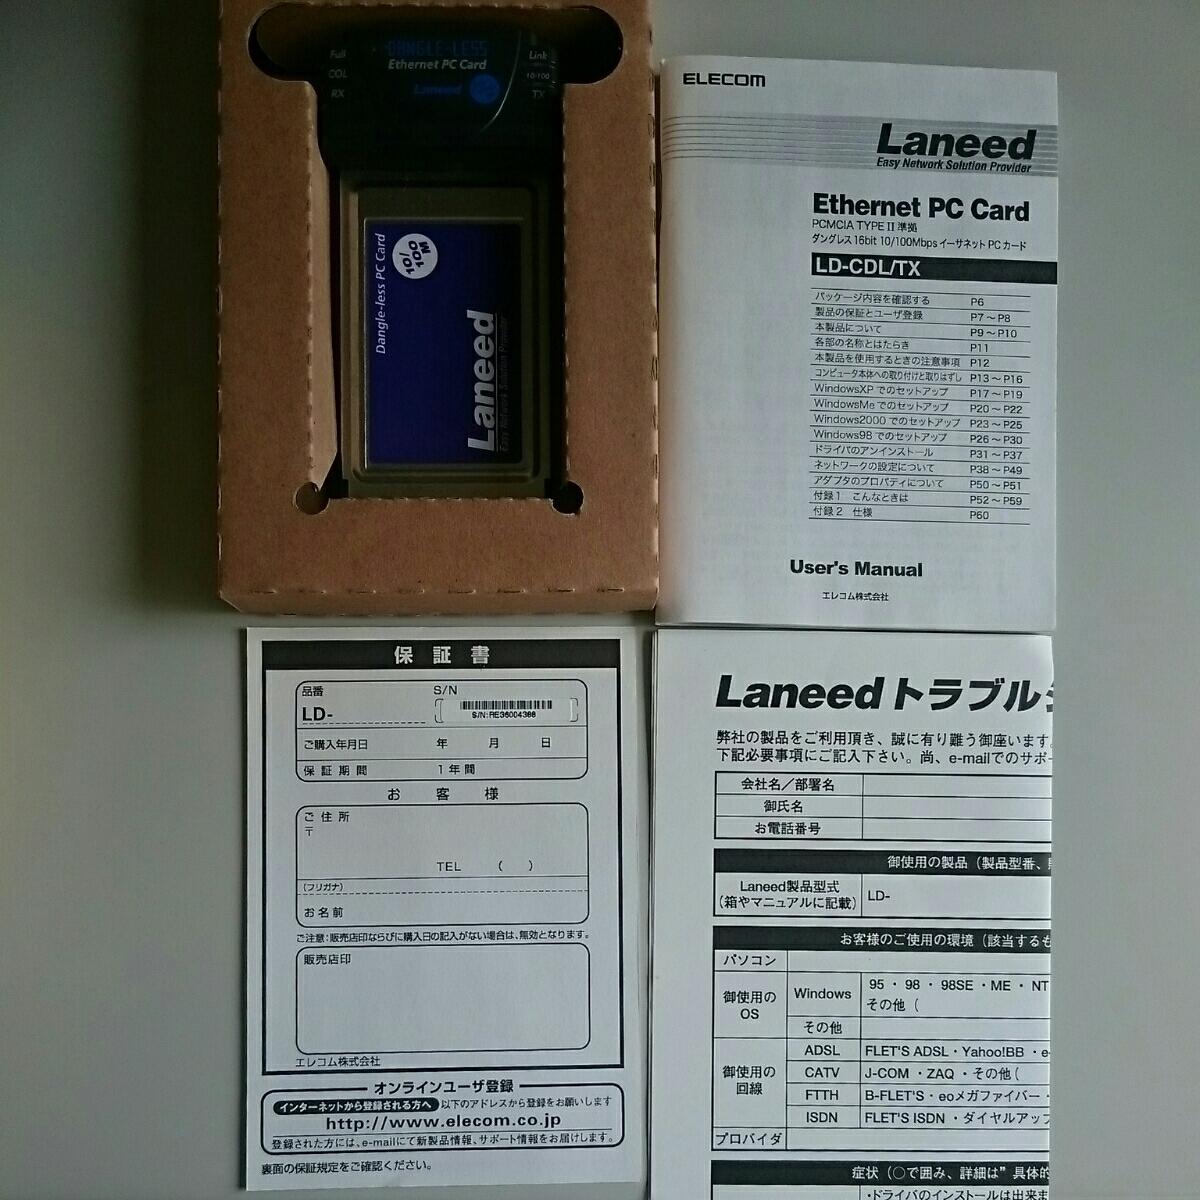 LANEED LD-CDLTX DRIVERS FOR MAC